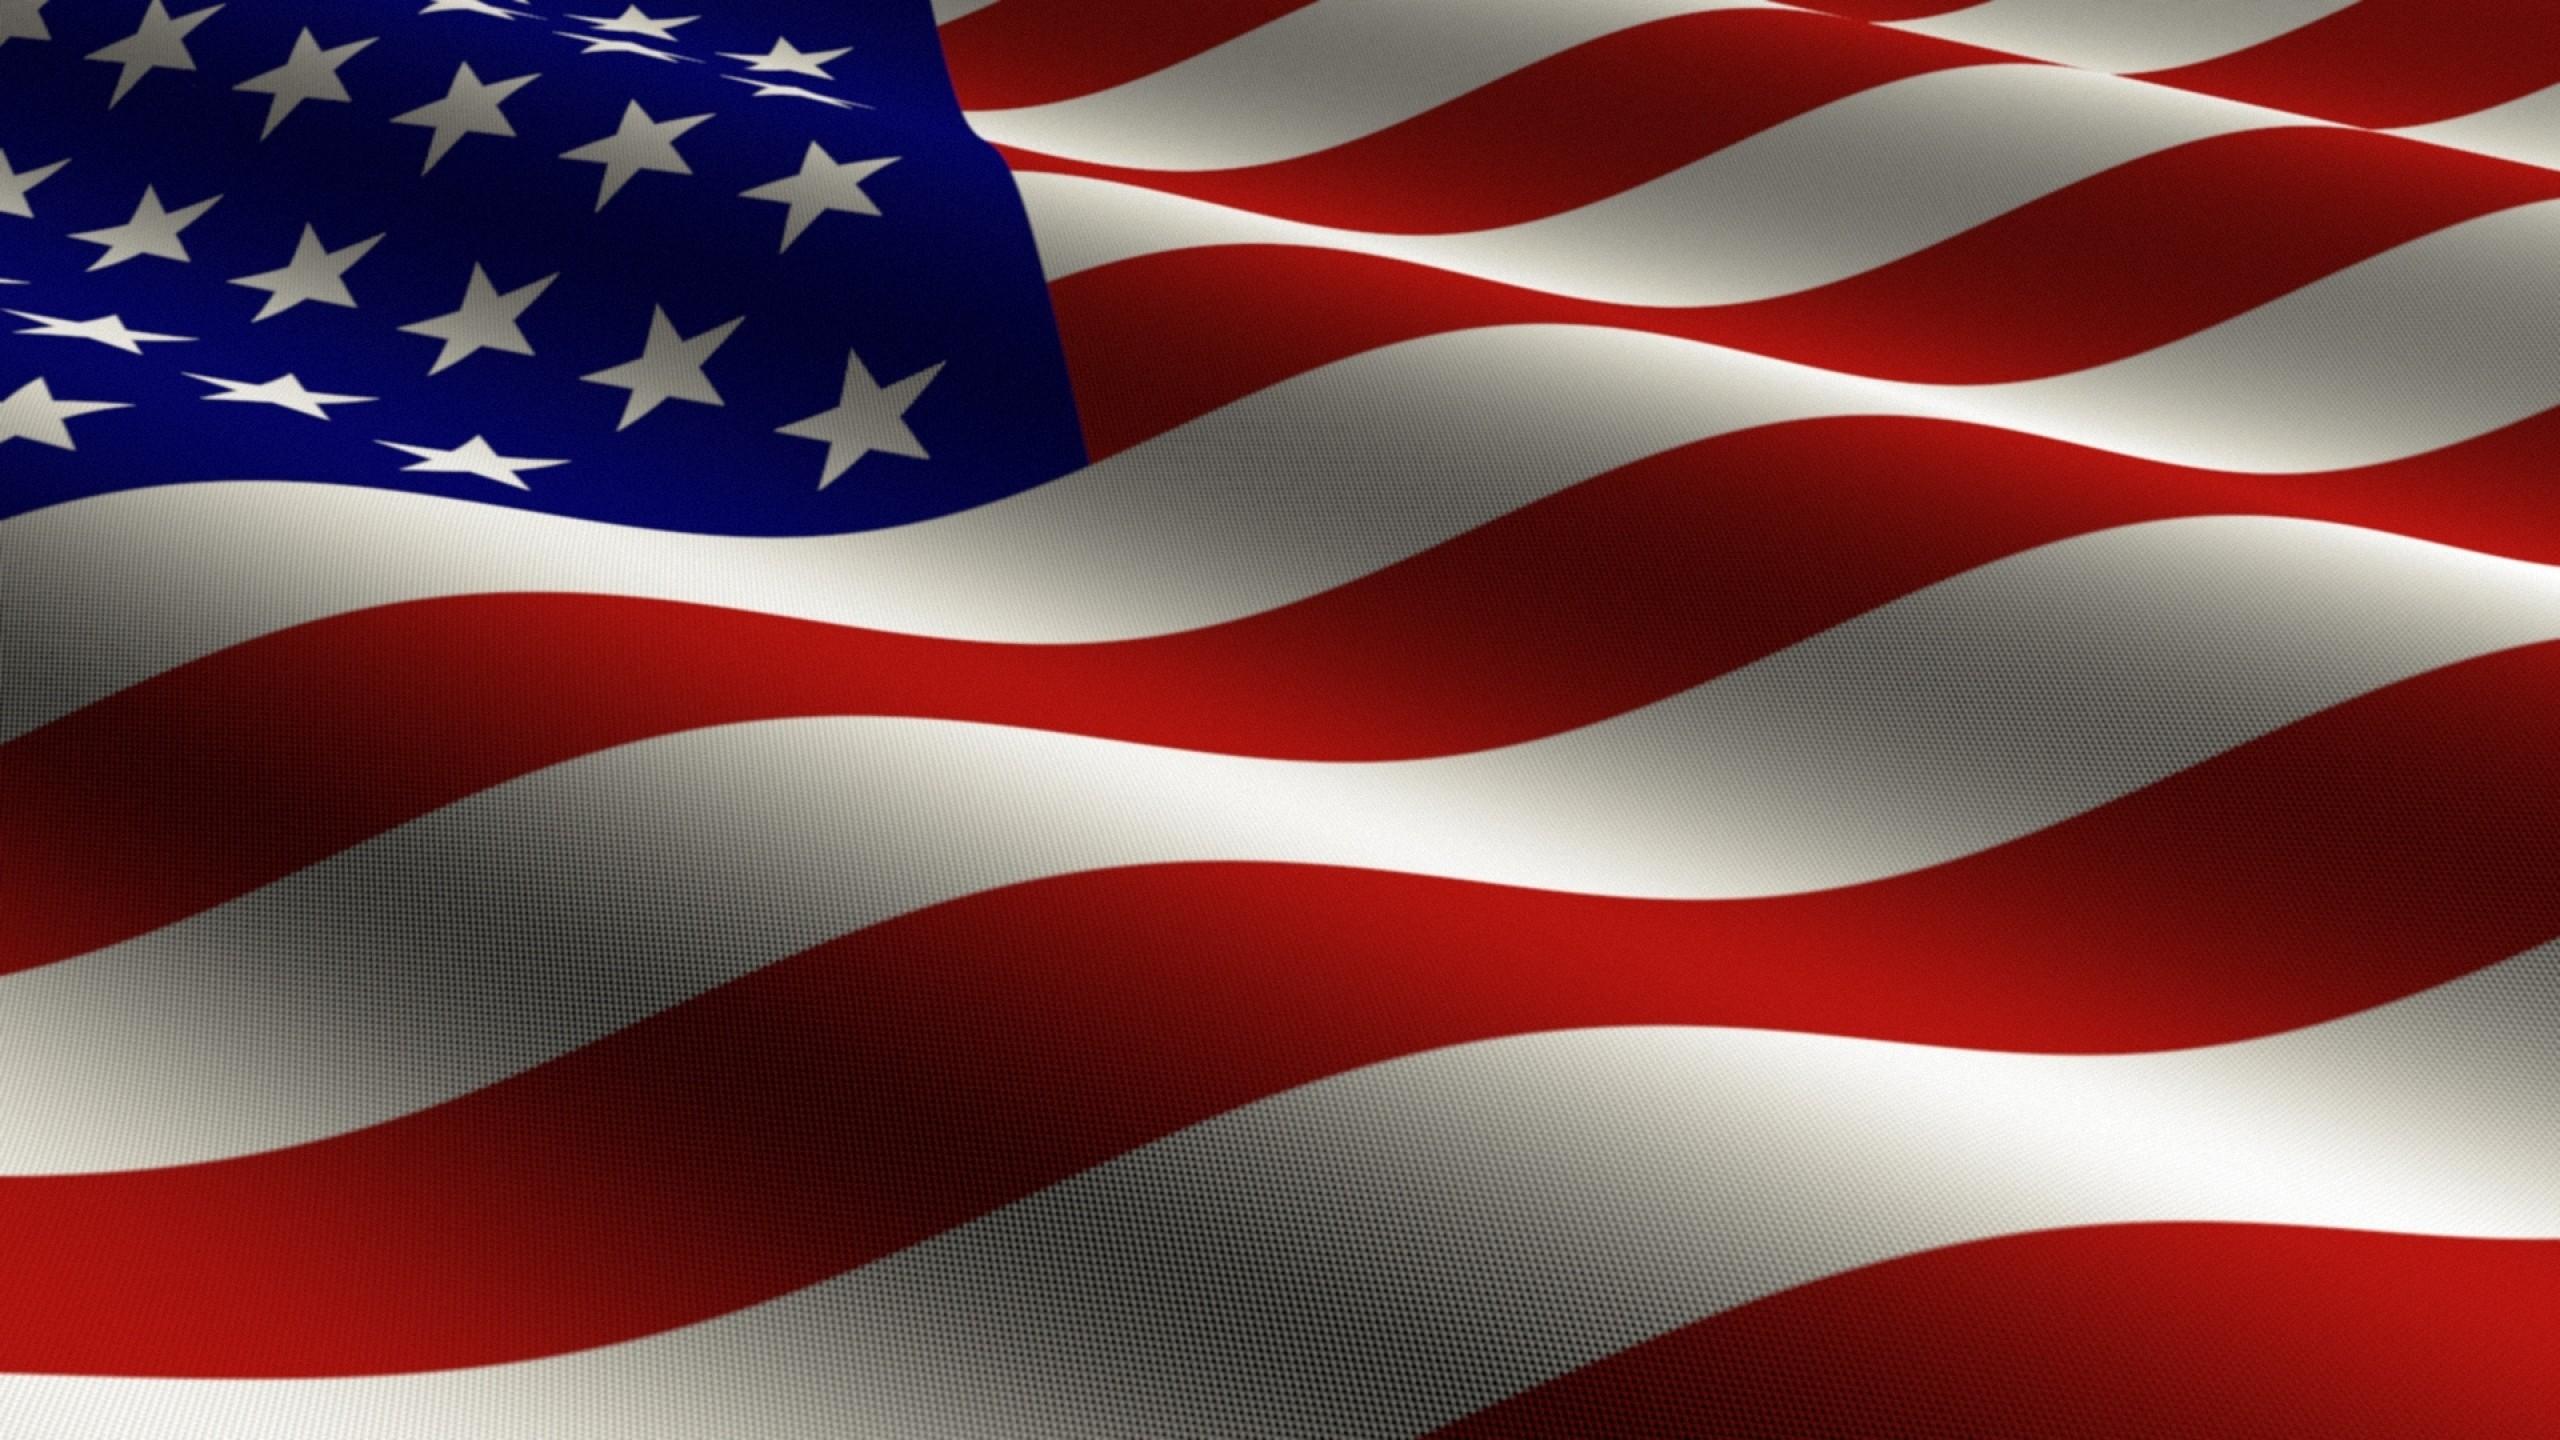 Preview wallpaper flag, united states, stars, stripes, symbol 2560×1440